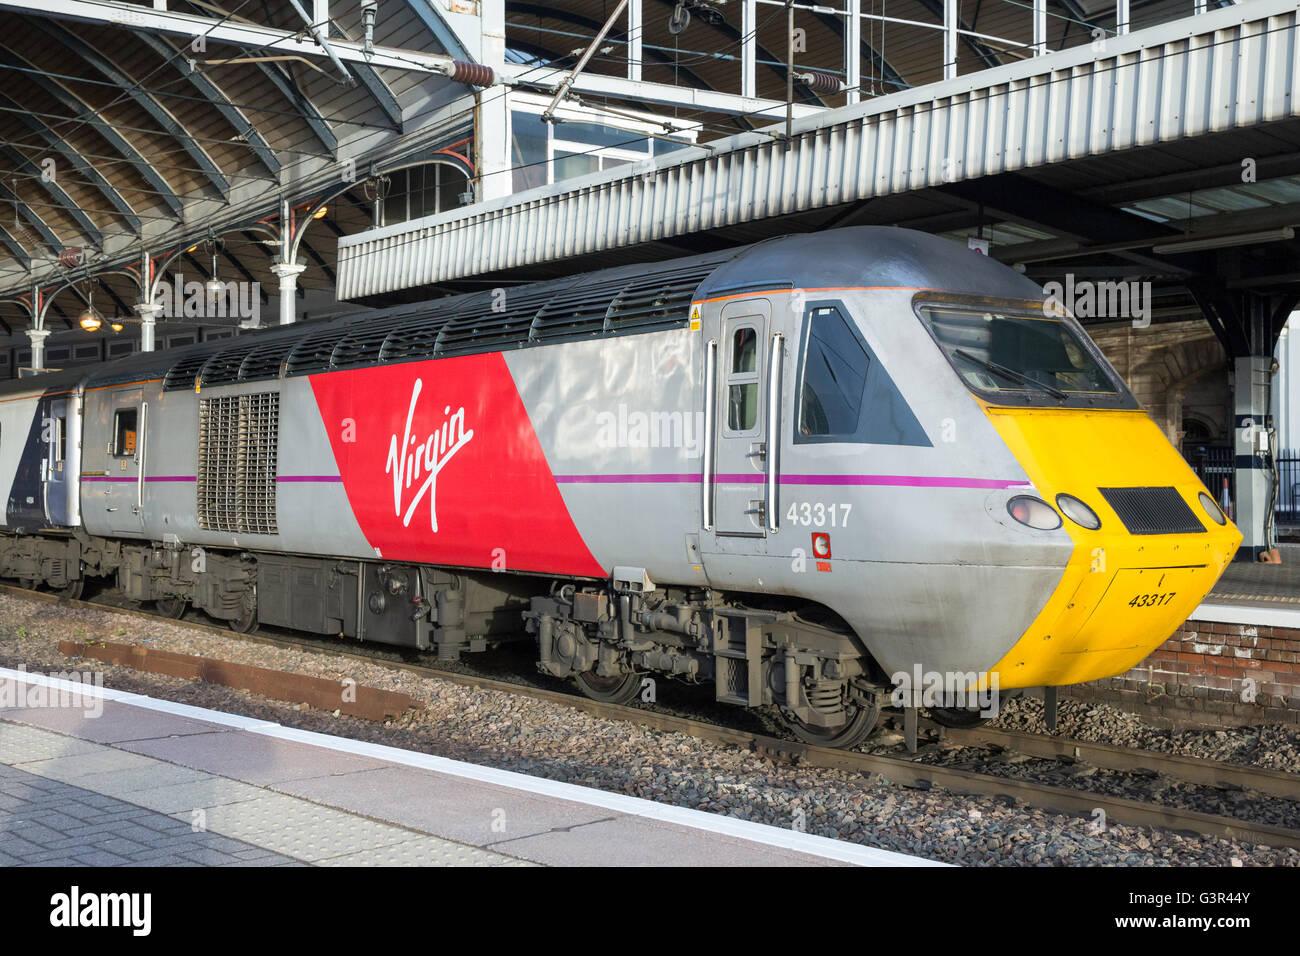 Virgin Trains East Coast 43317 sits on Platform 2 at Newcastle Central Station - Stock Image